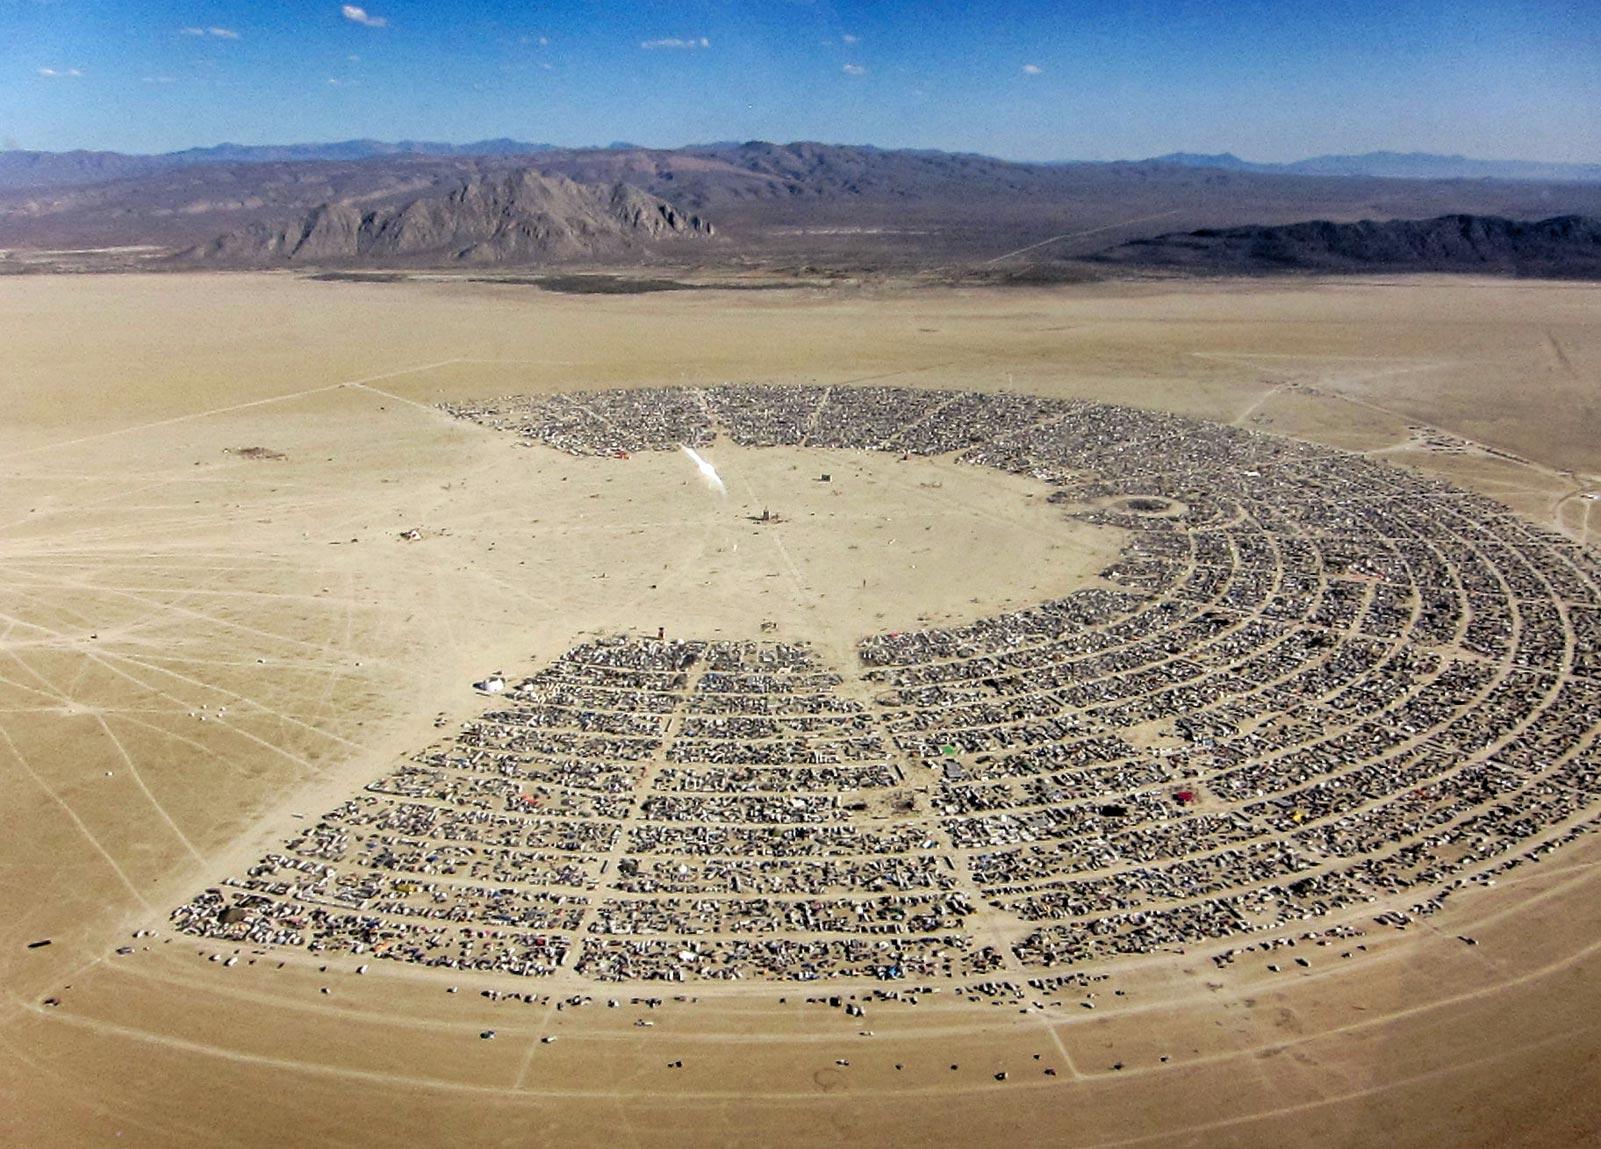 Burning Man Festival | Whale Lifestyle